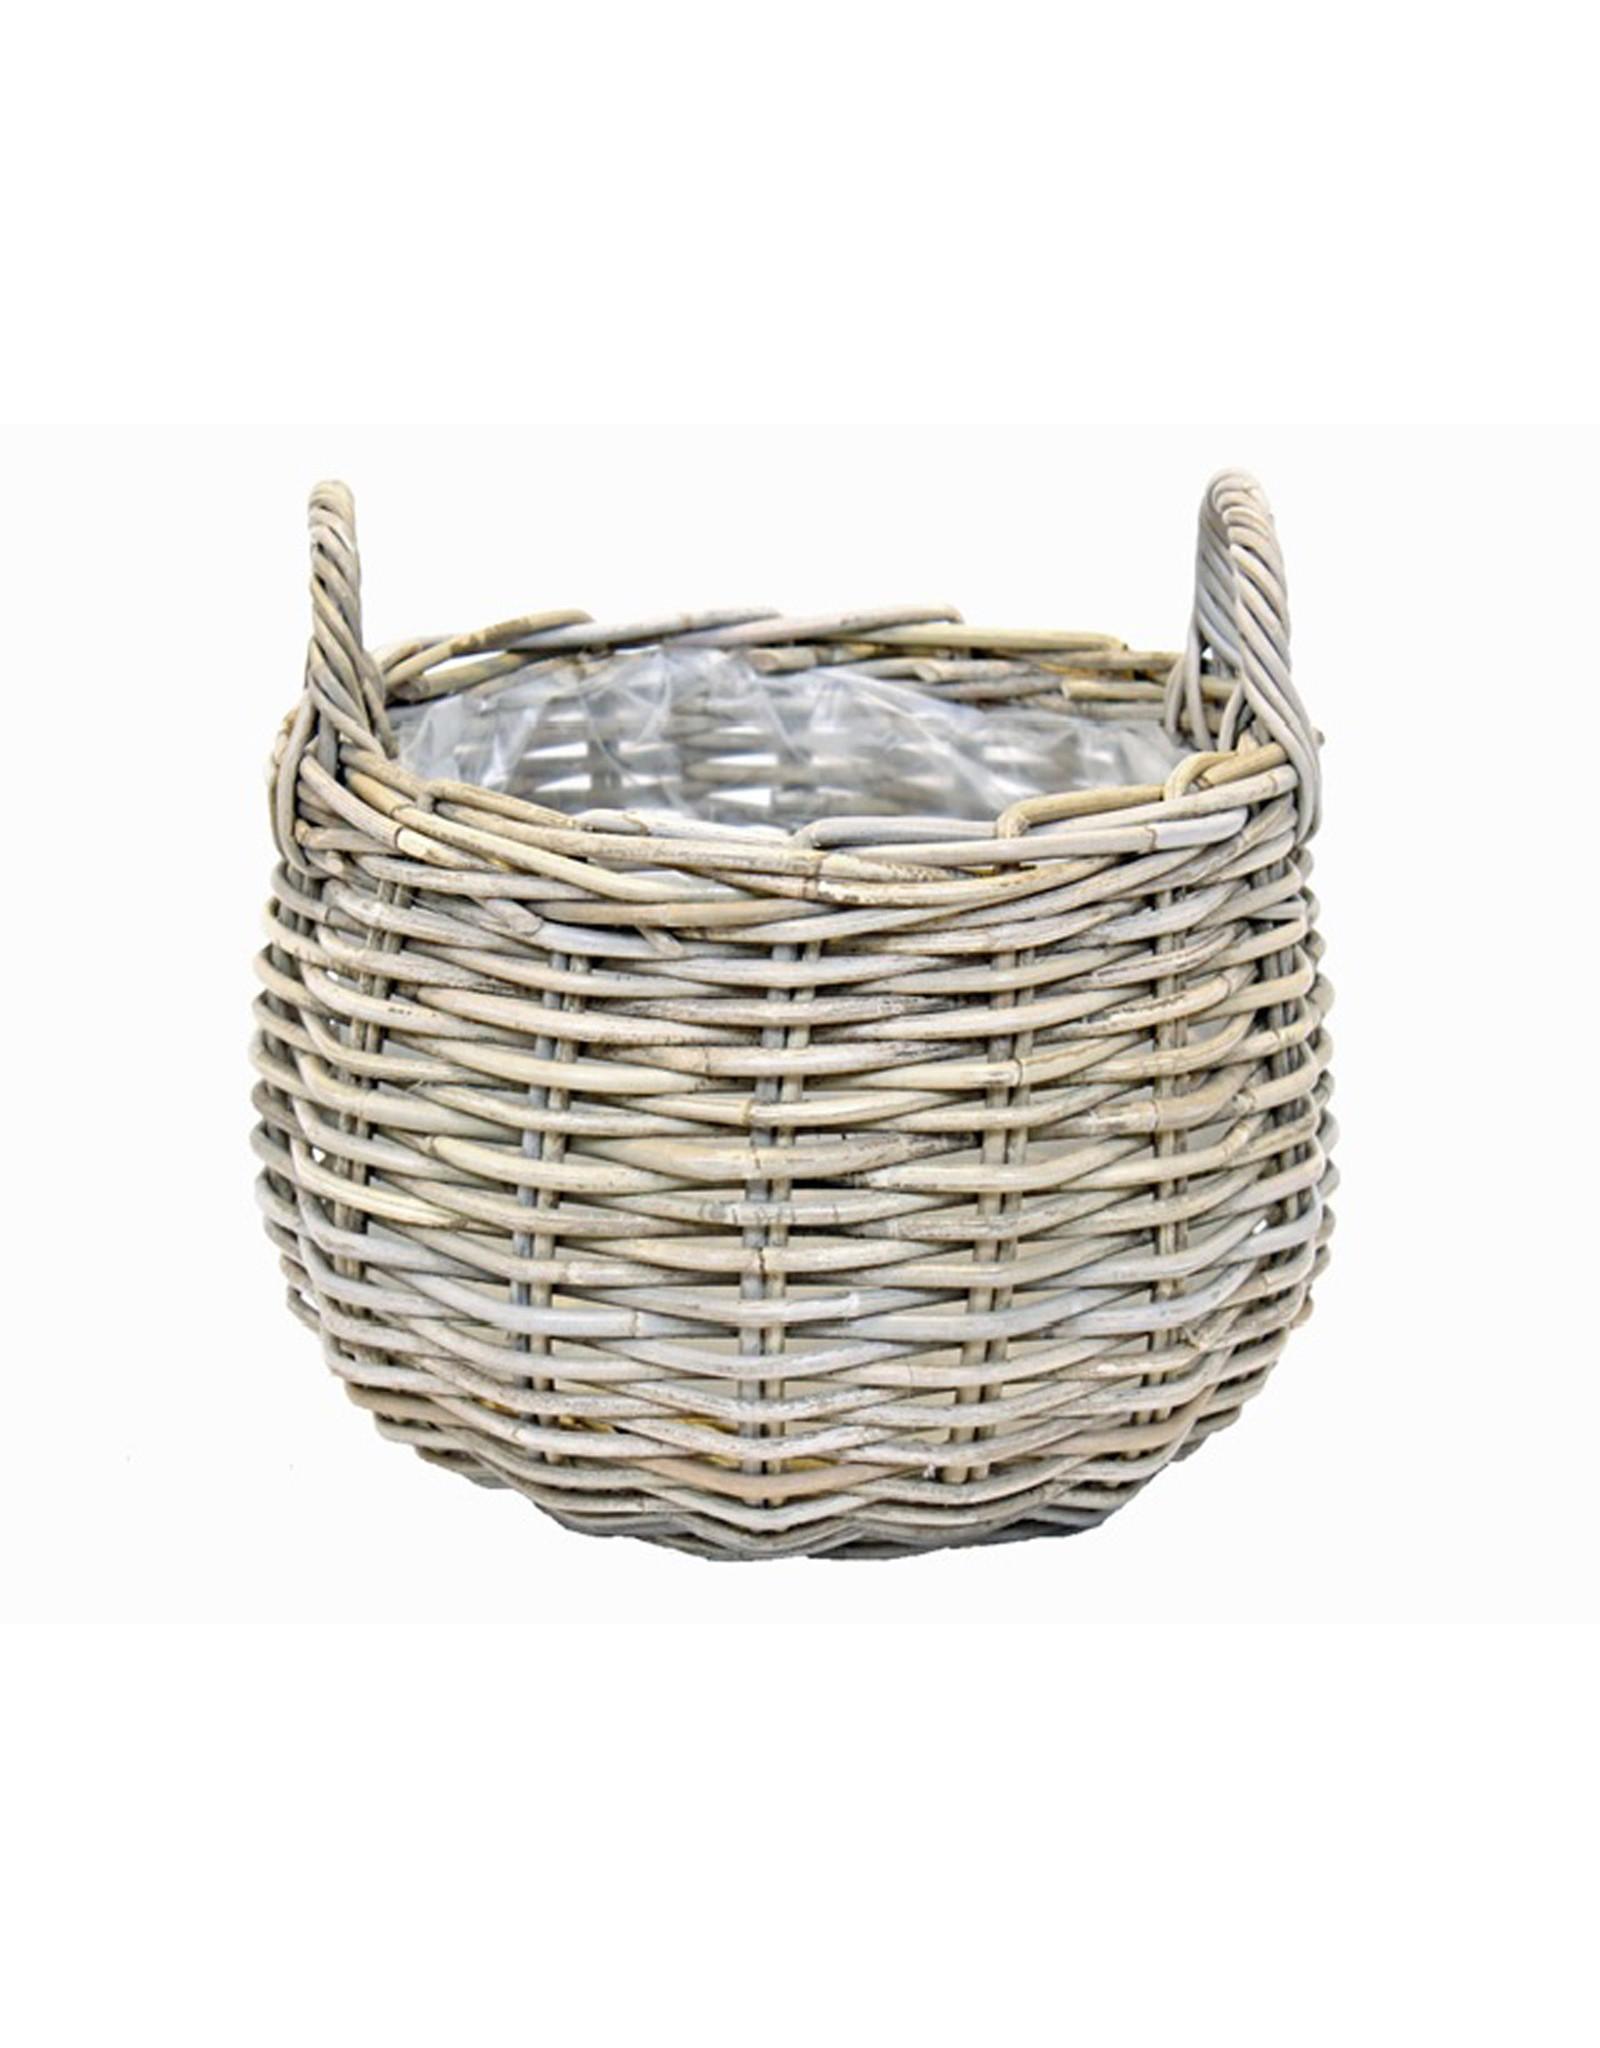 Van der Leeden Mandwerk Basket Rattan Grey With Lining Rnd                                                      D22H16Cm